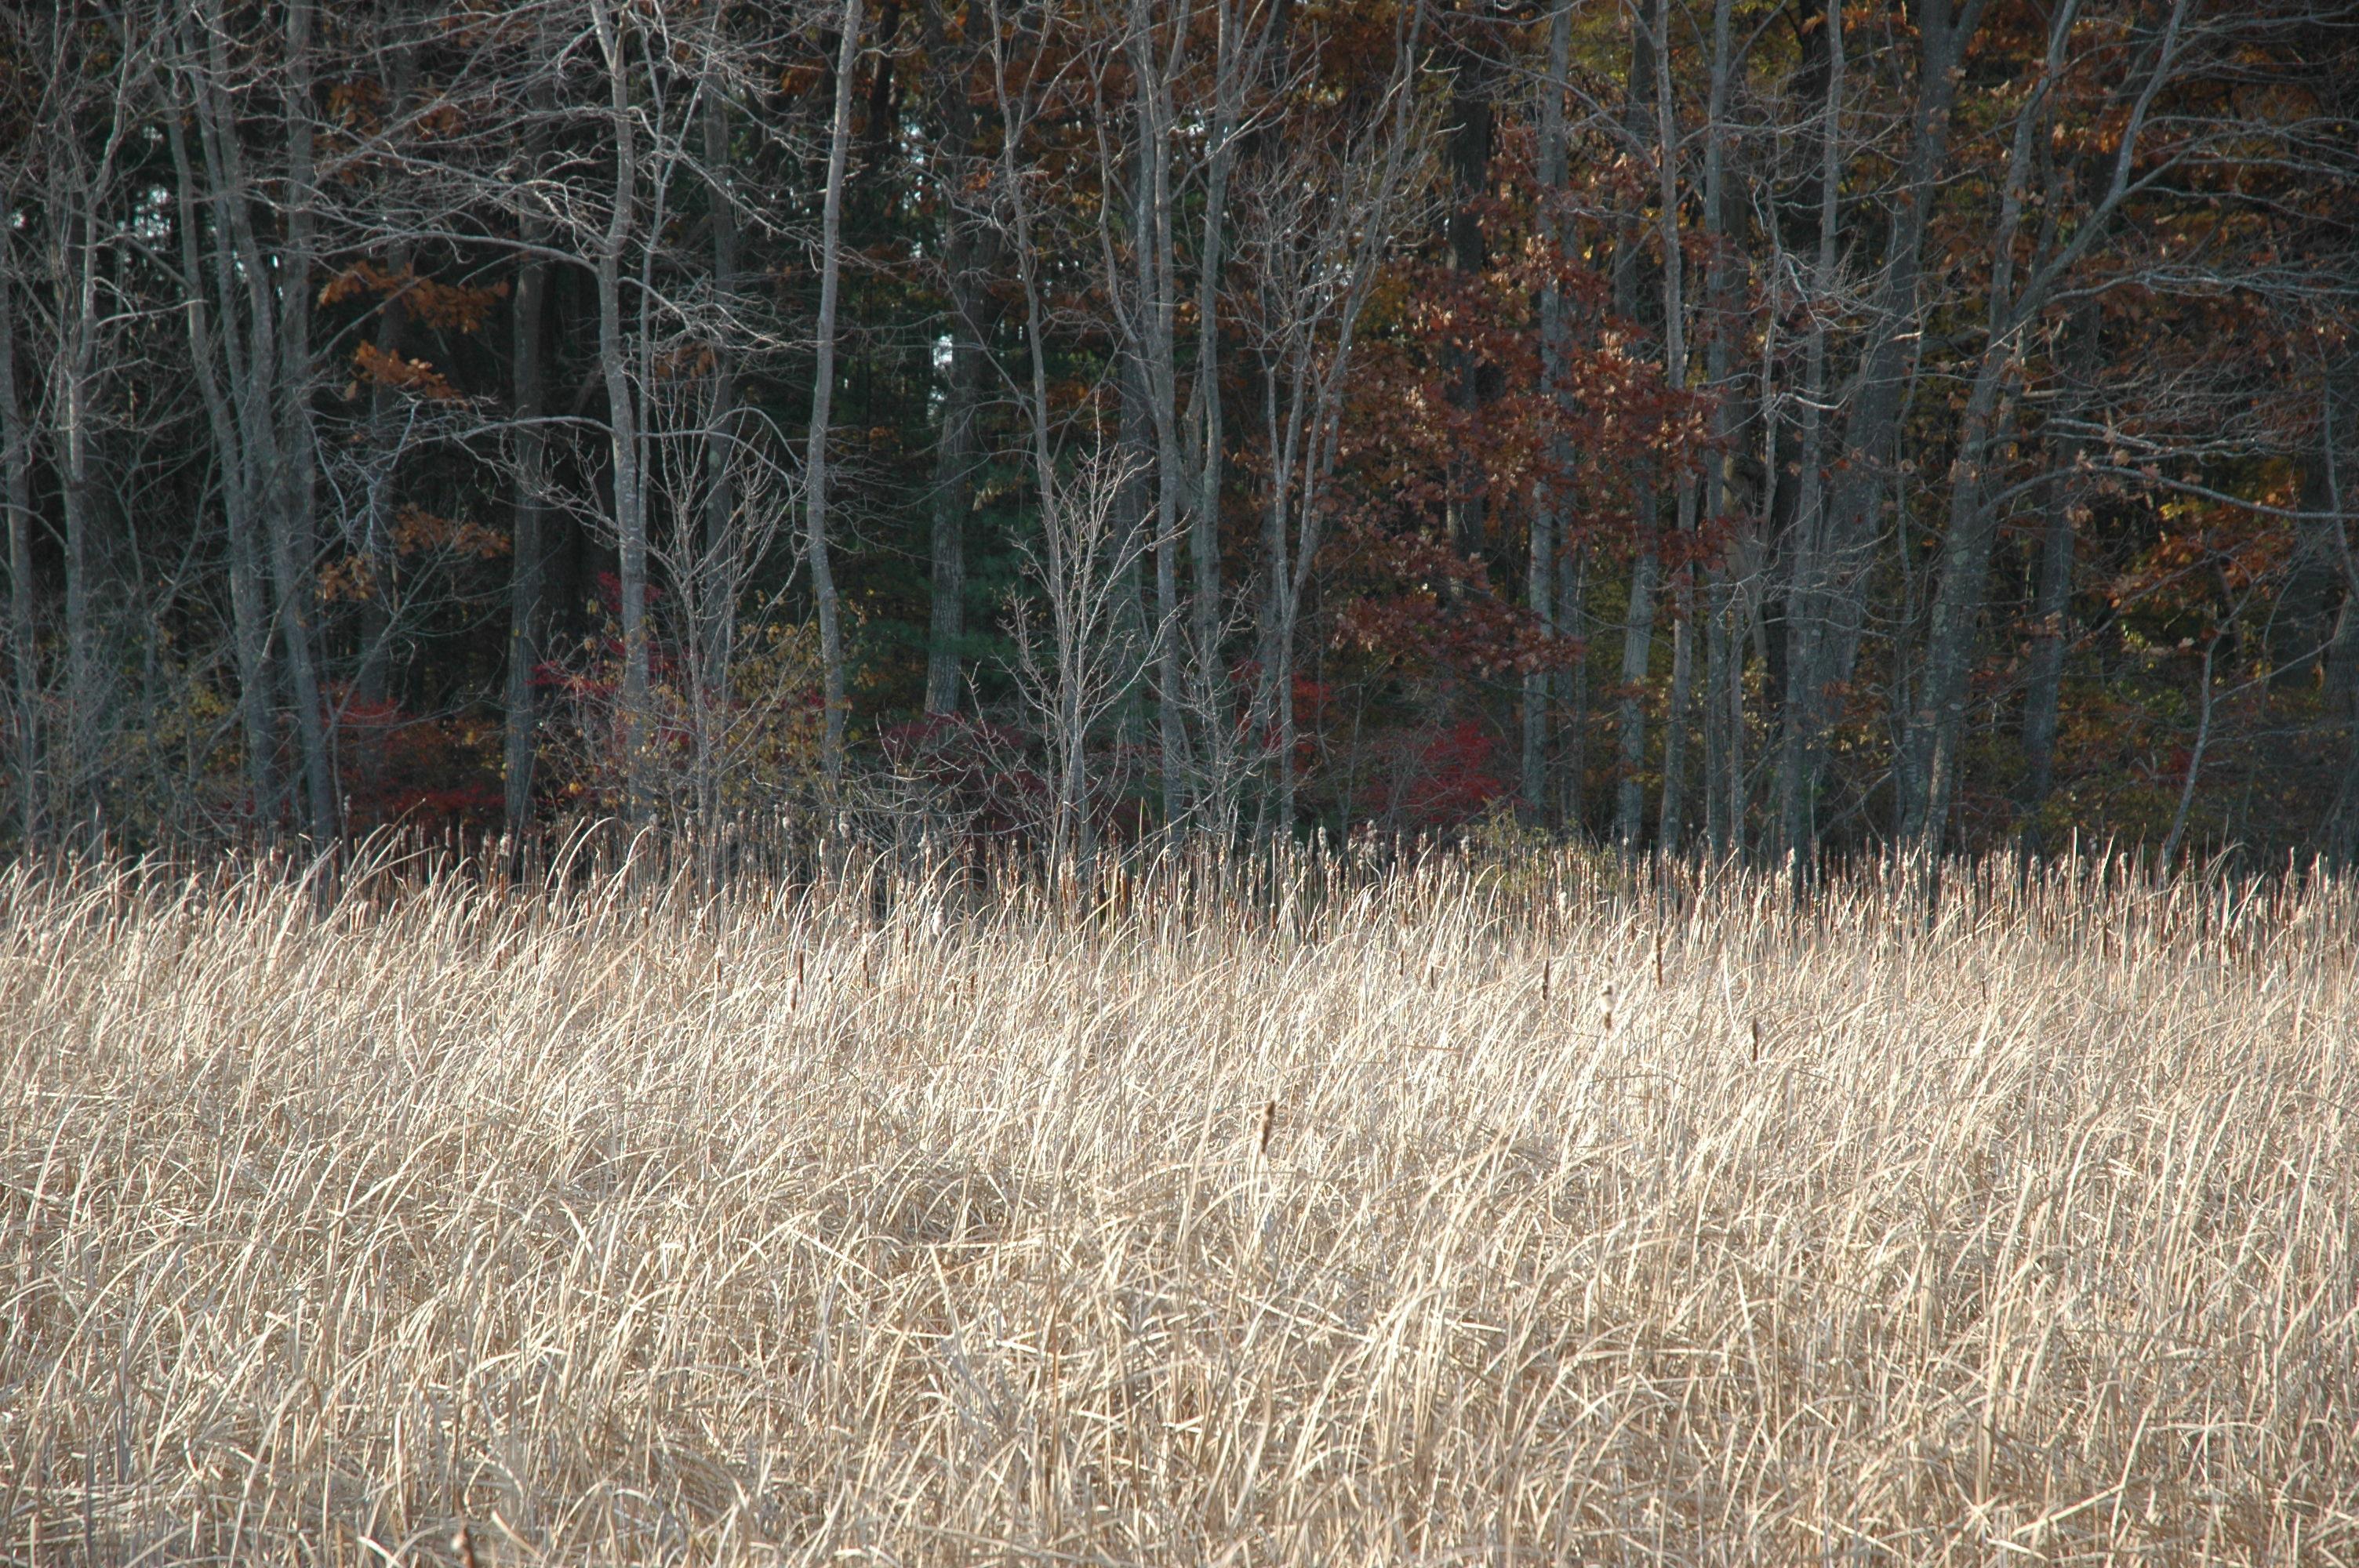 Nov_4_2008 179